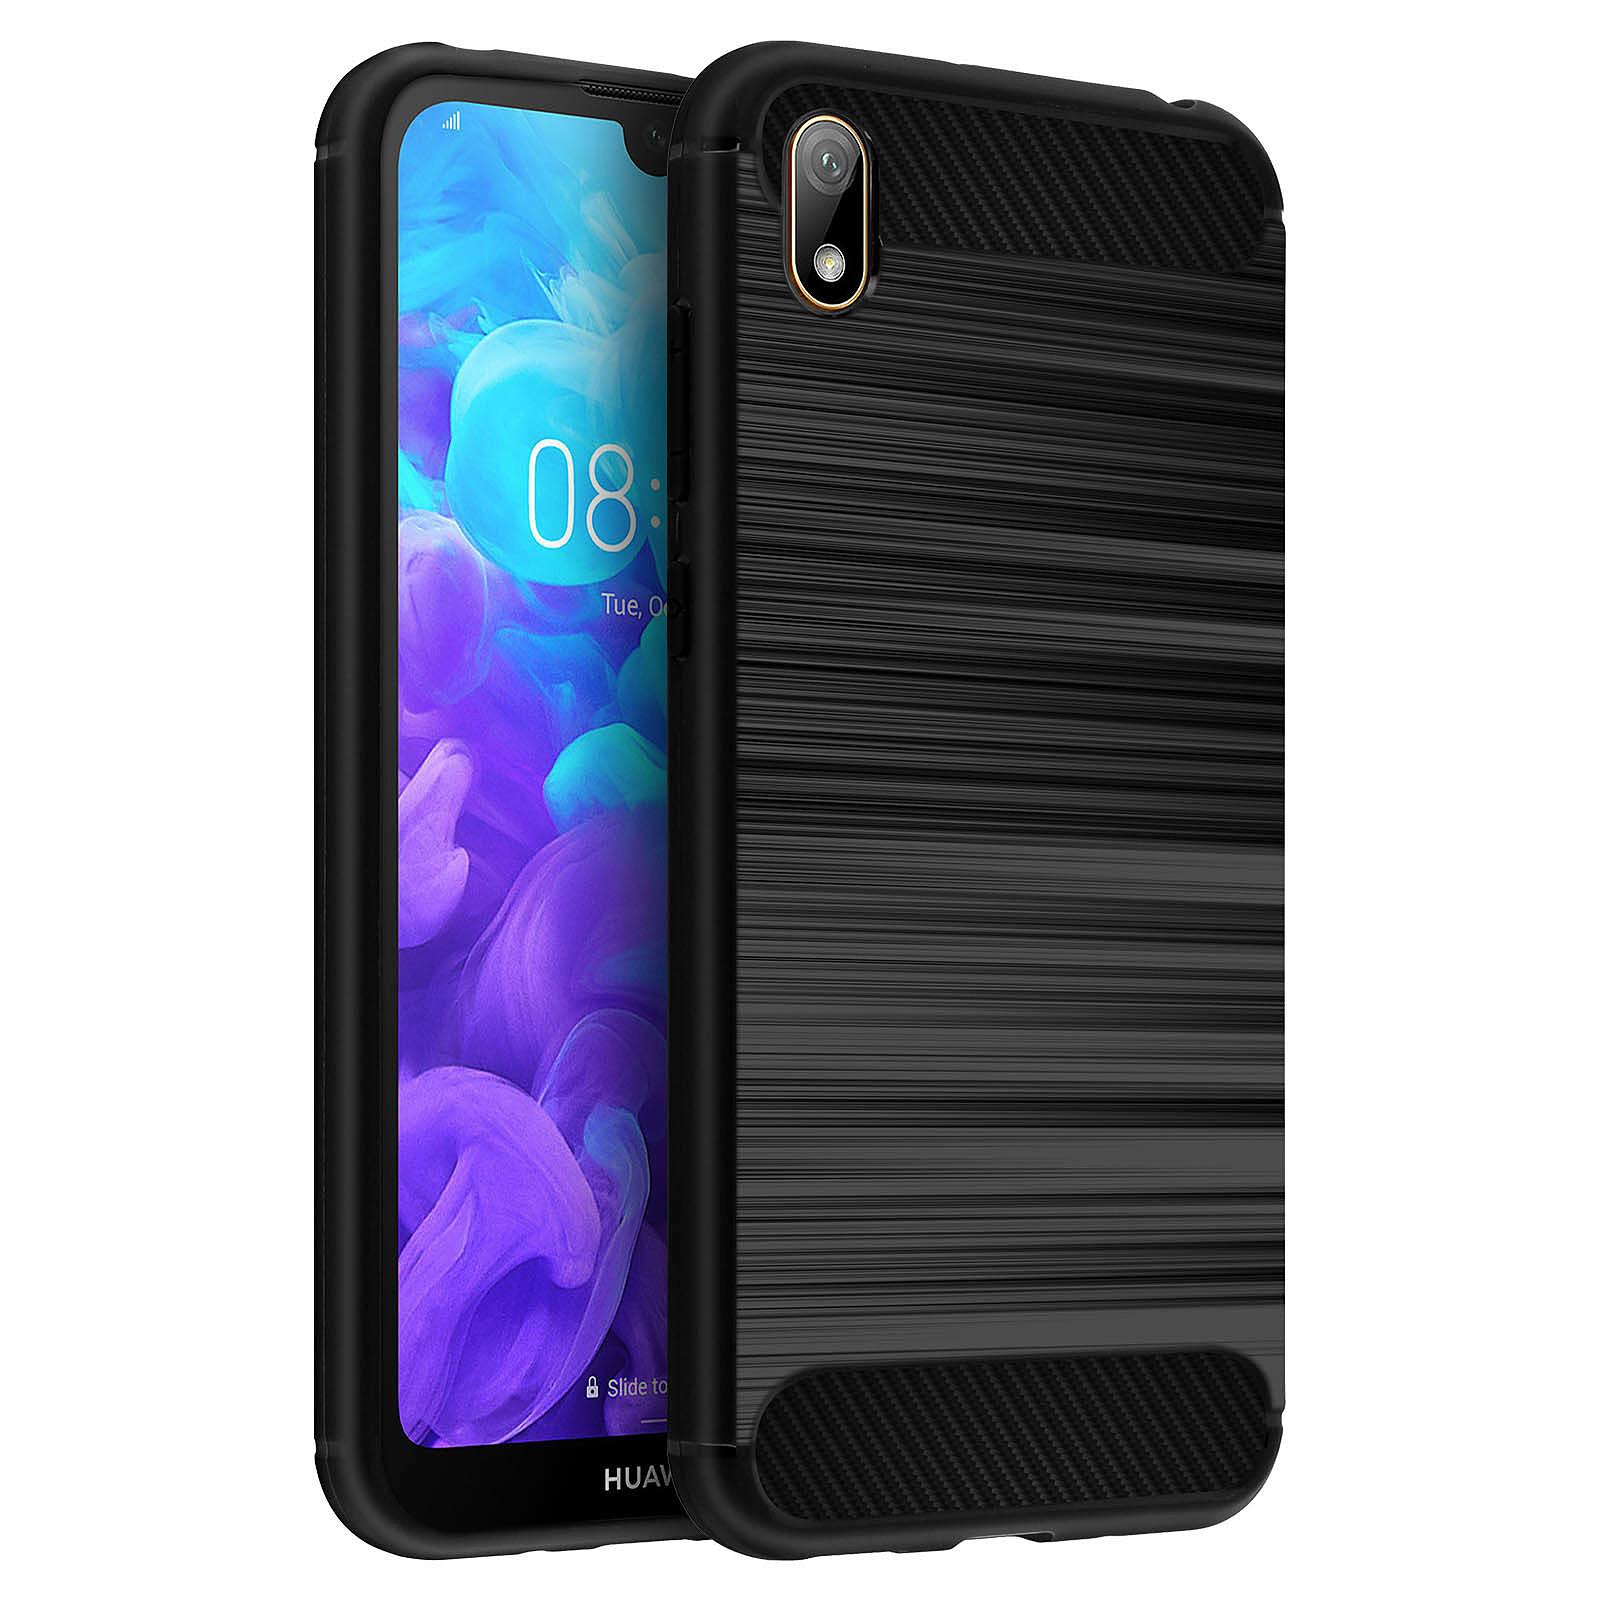 Avizar Coque Noir pour Huawei Y5 2019 , Honor 8S